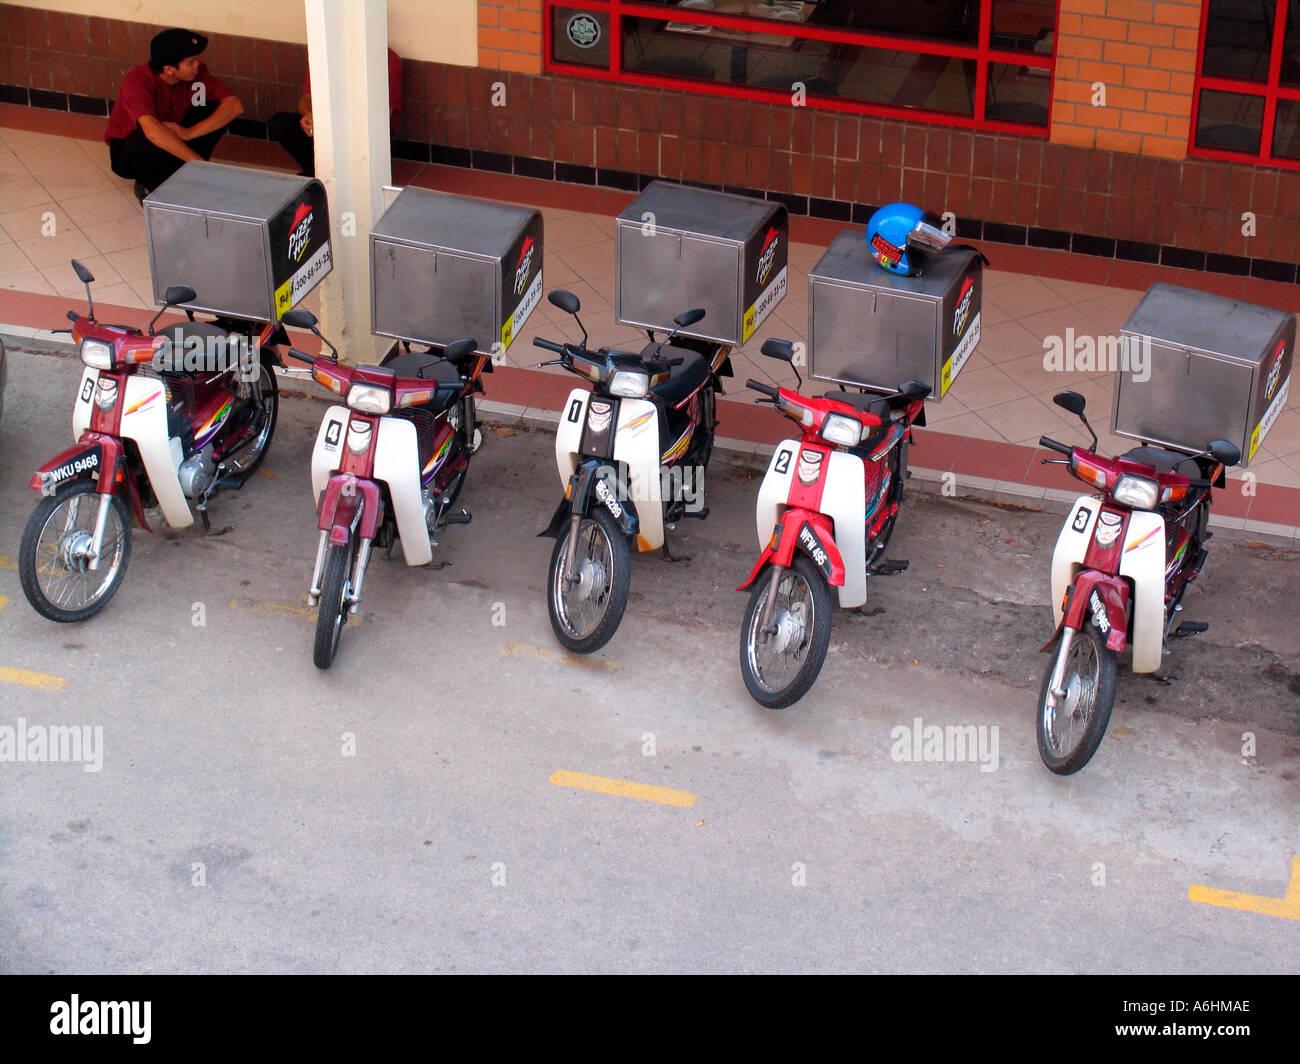 Pizza Hut Delivery Mopeds Wth Warm Storage Boxes Kota Bharu Malaysia